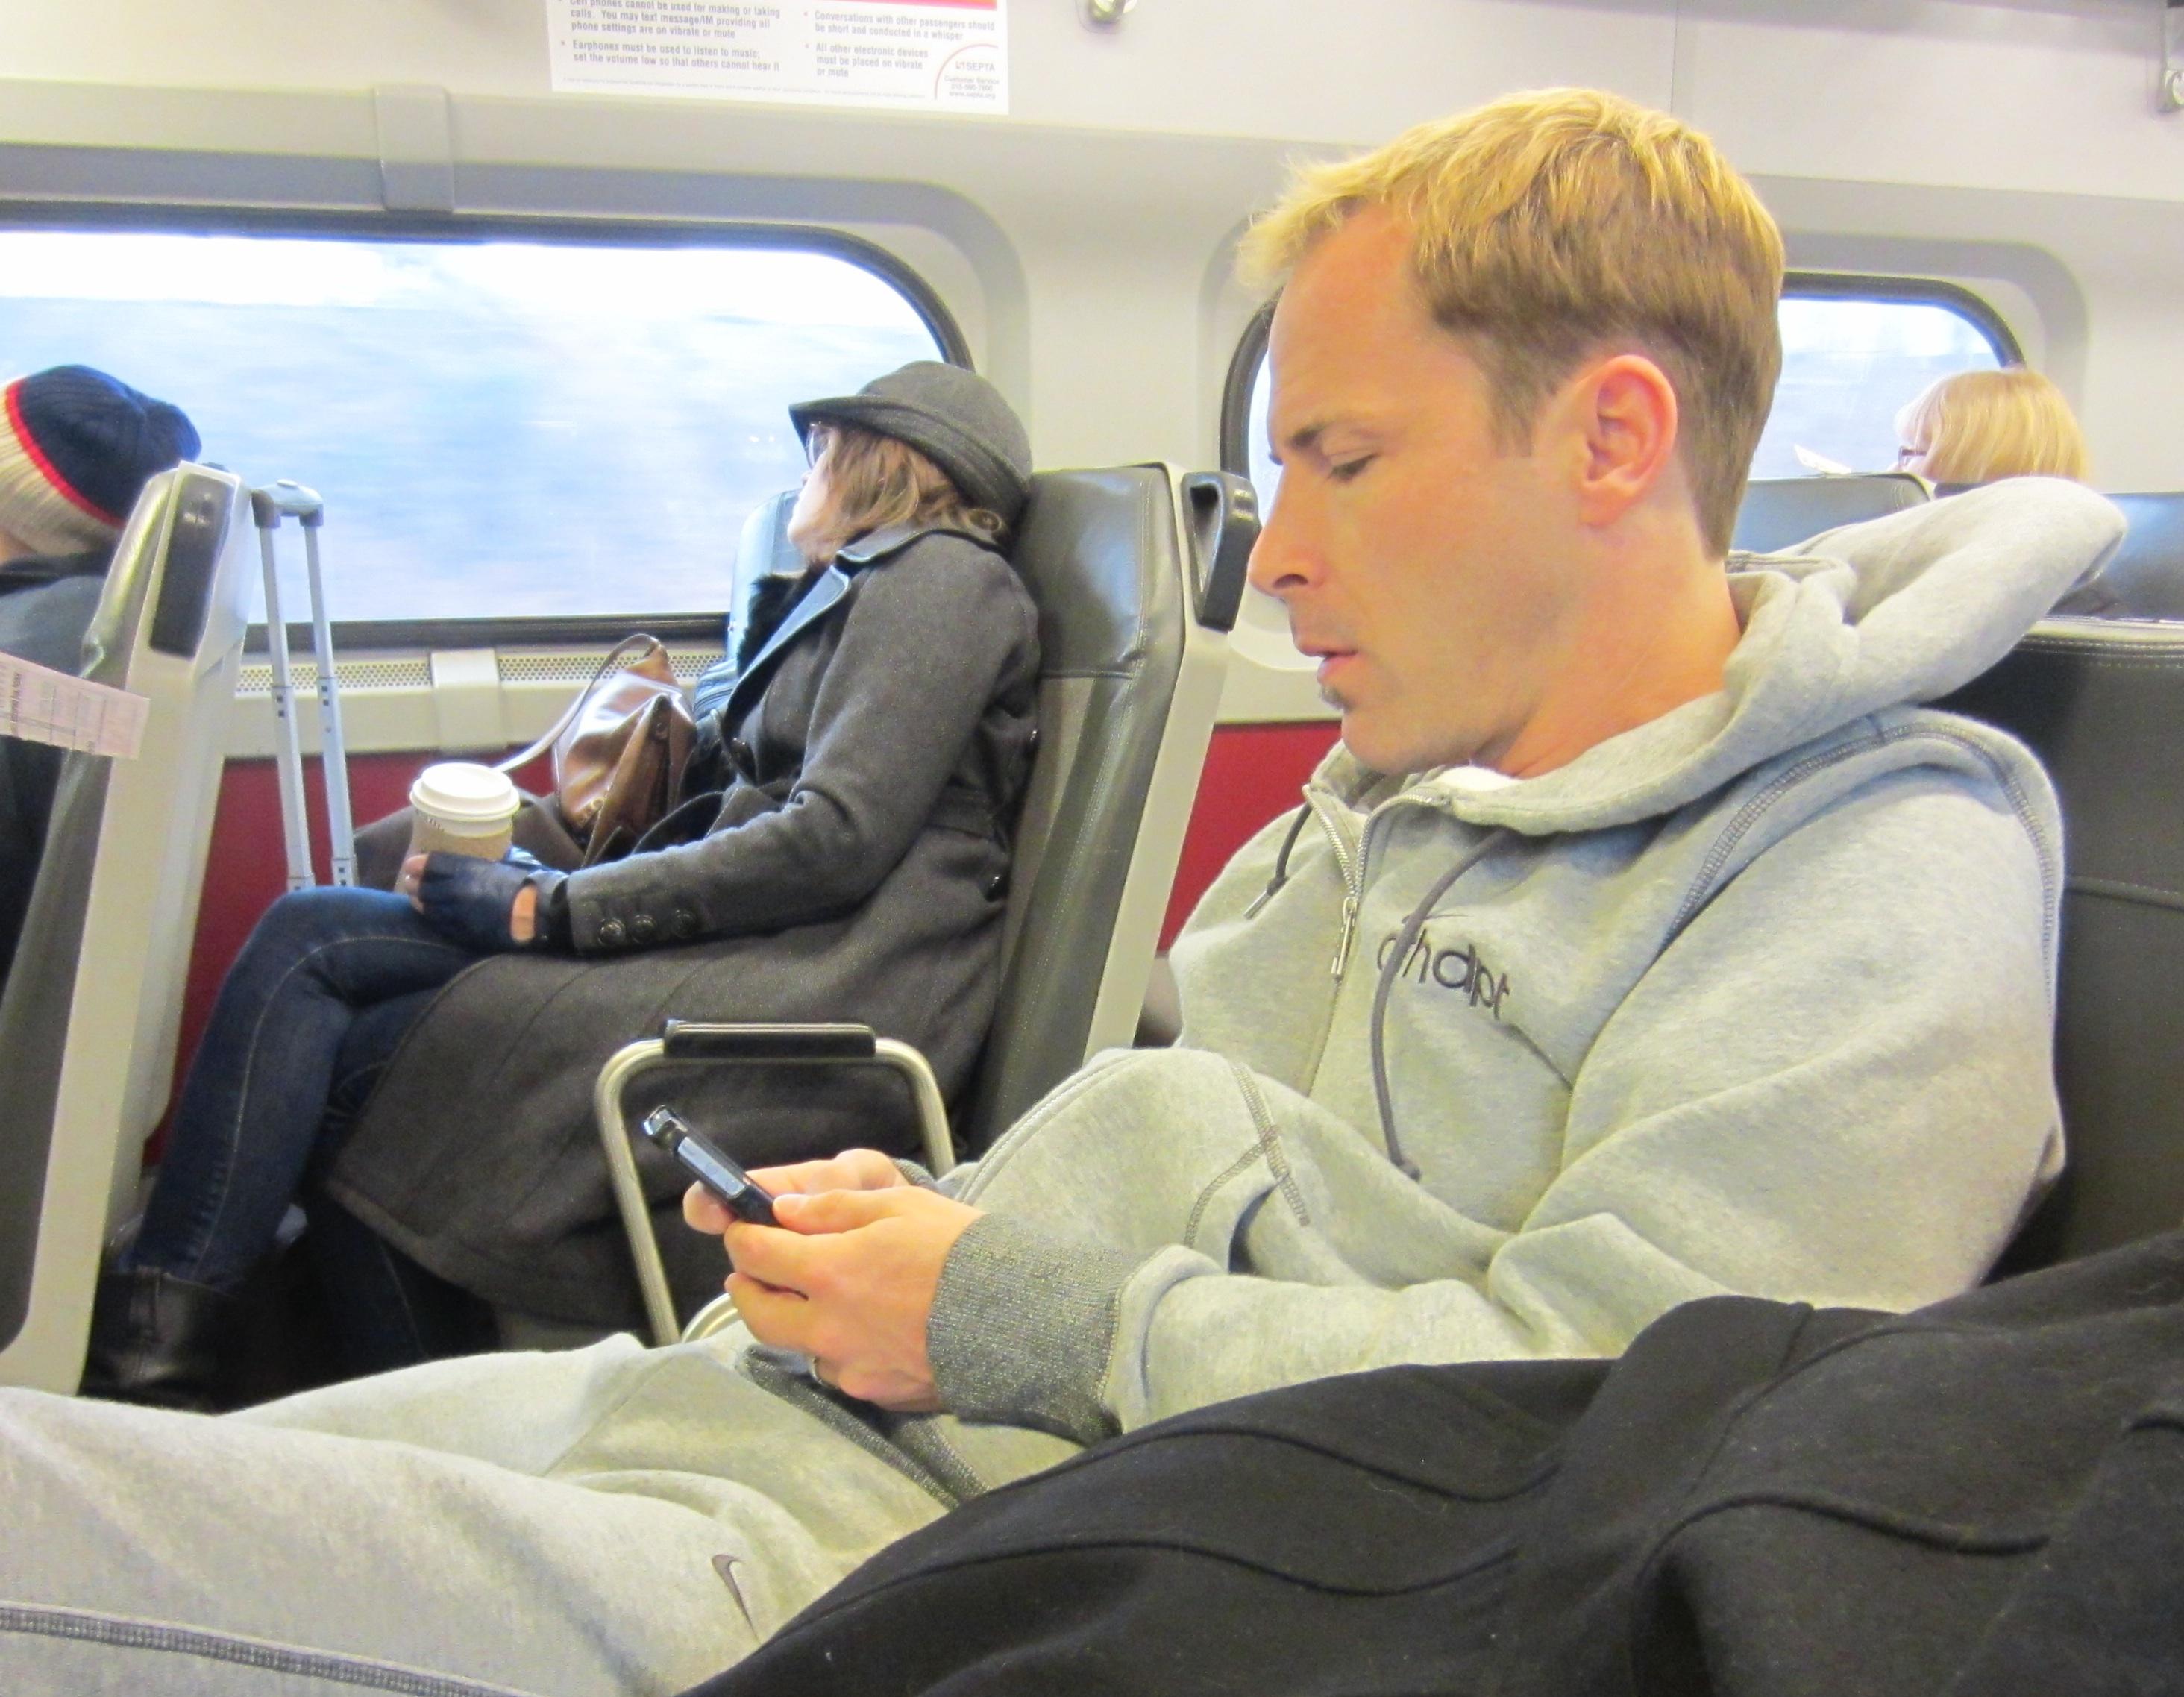 Philly Scott on Train